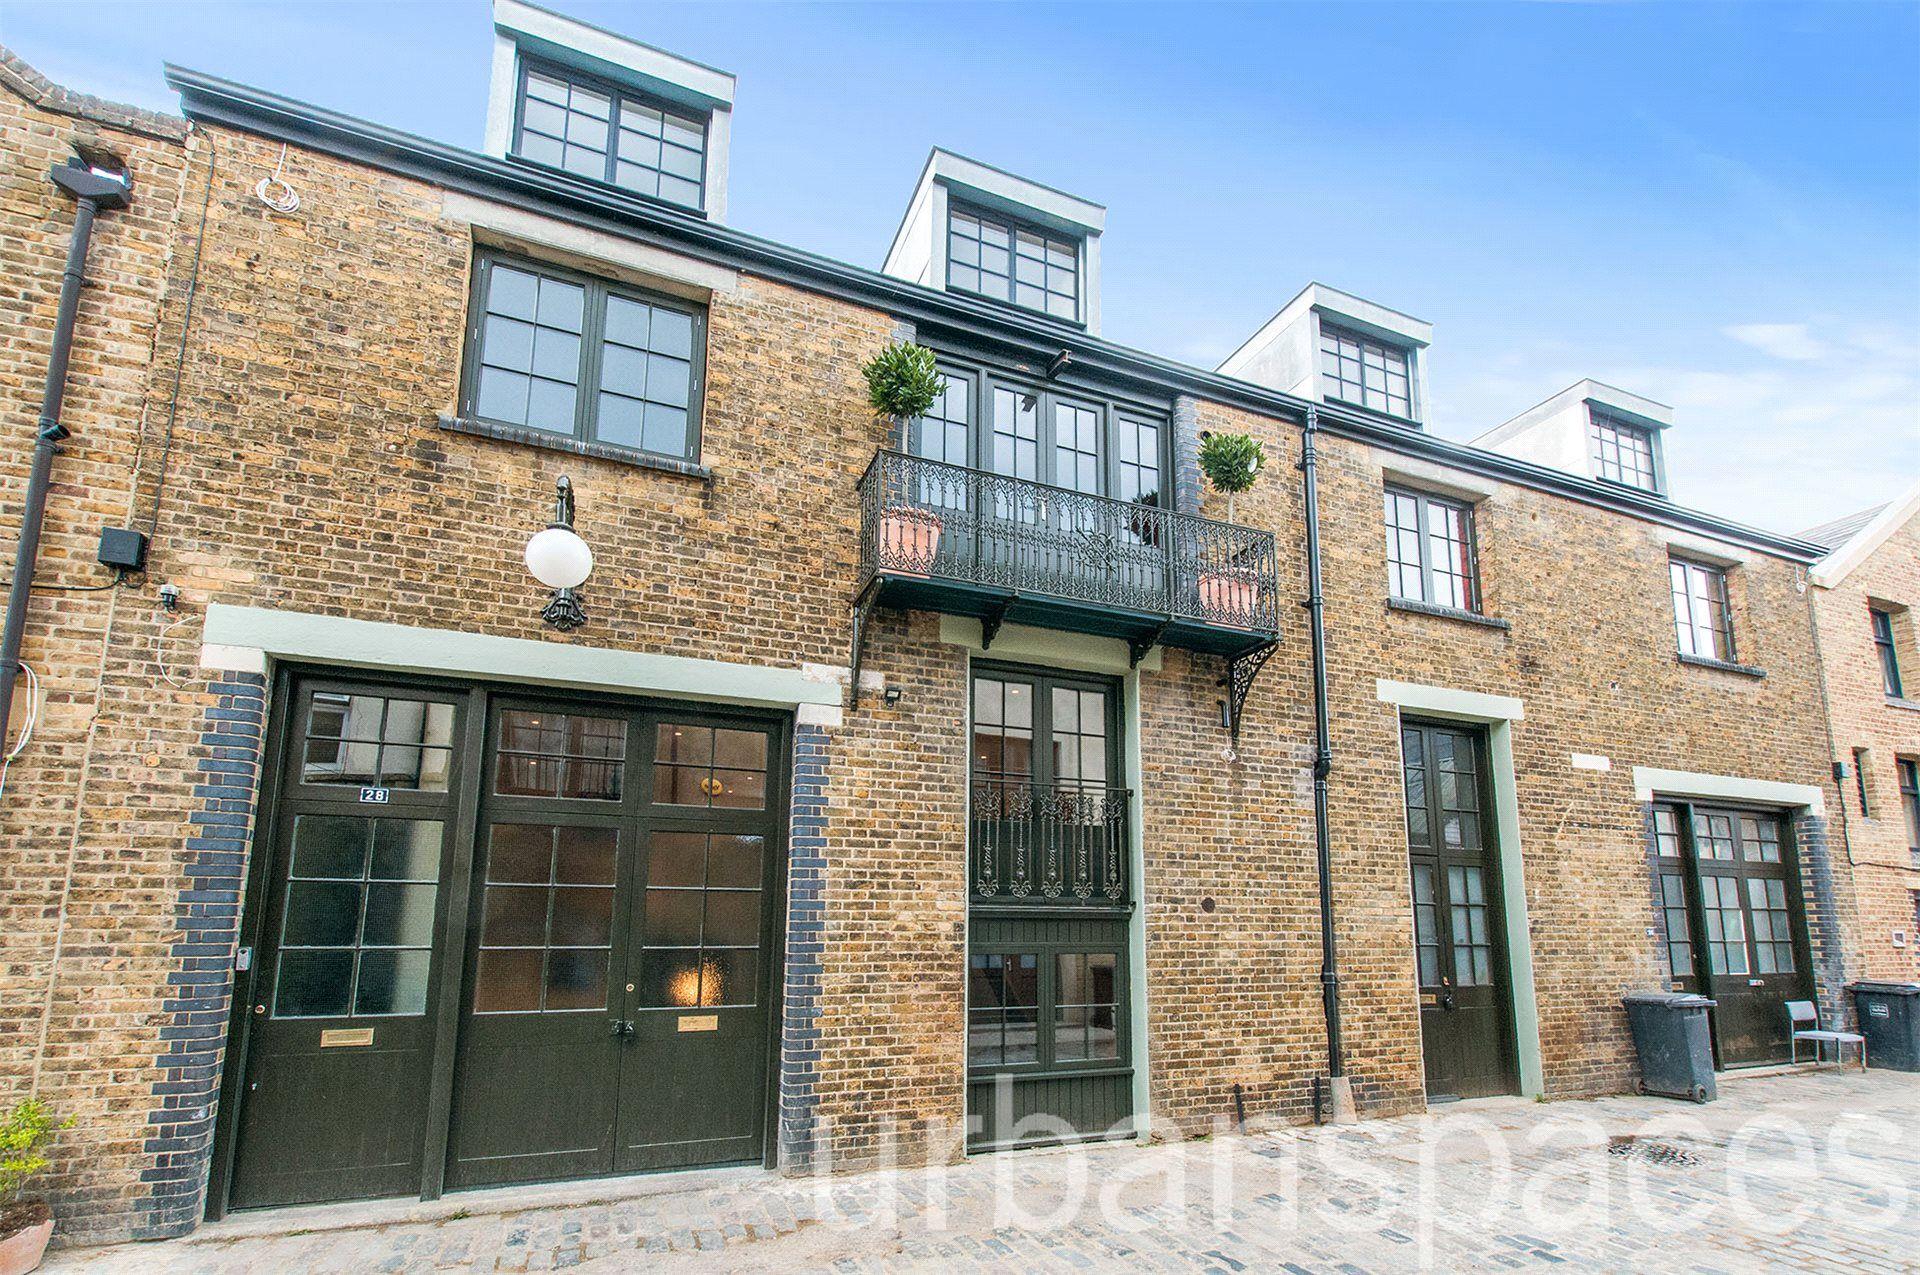 2 Bedroom House for sale on Havelock Walk, London, SE23